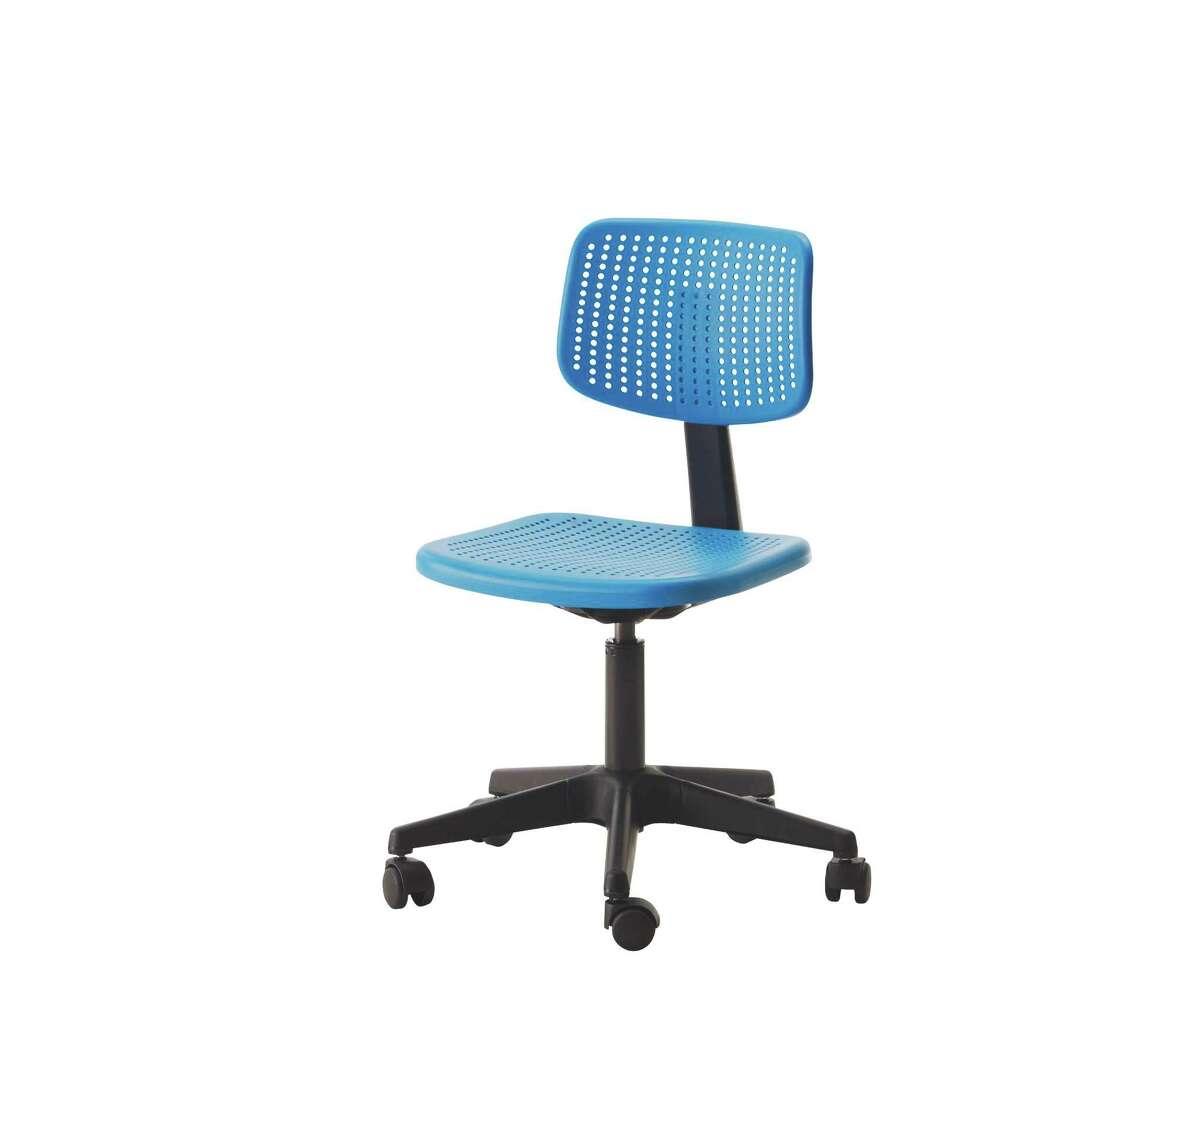 Alrik swivel chair, $14.99 at Ikea